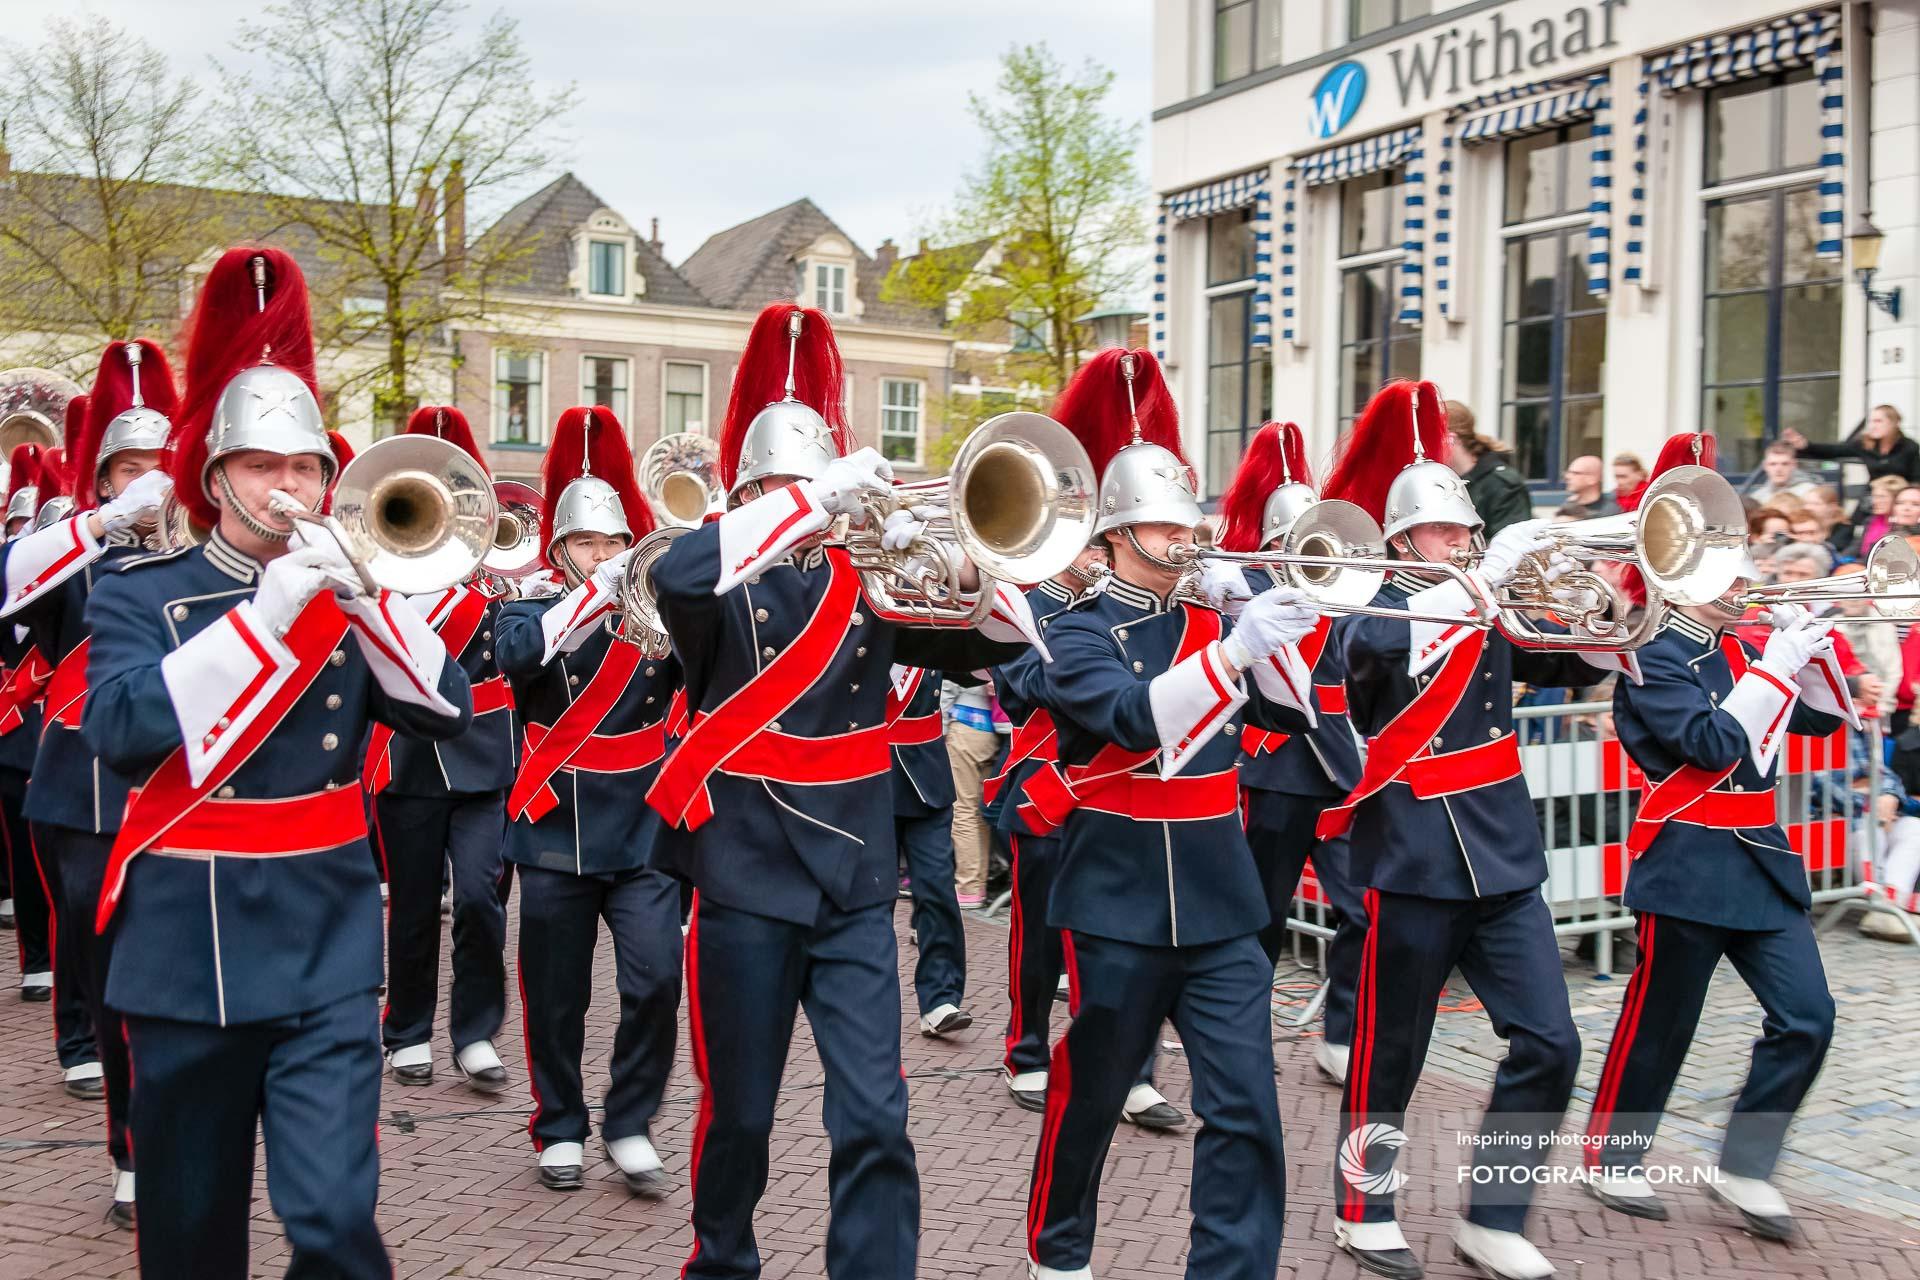 Boeking plaatsen | KTK | marsparade | Kampen | fotograaf | fotografie © Fotografiecor.nl